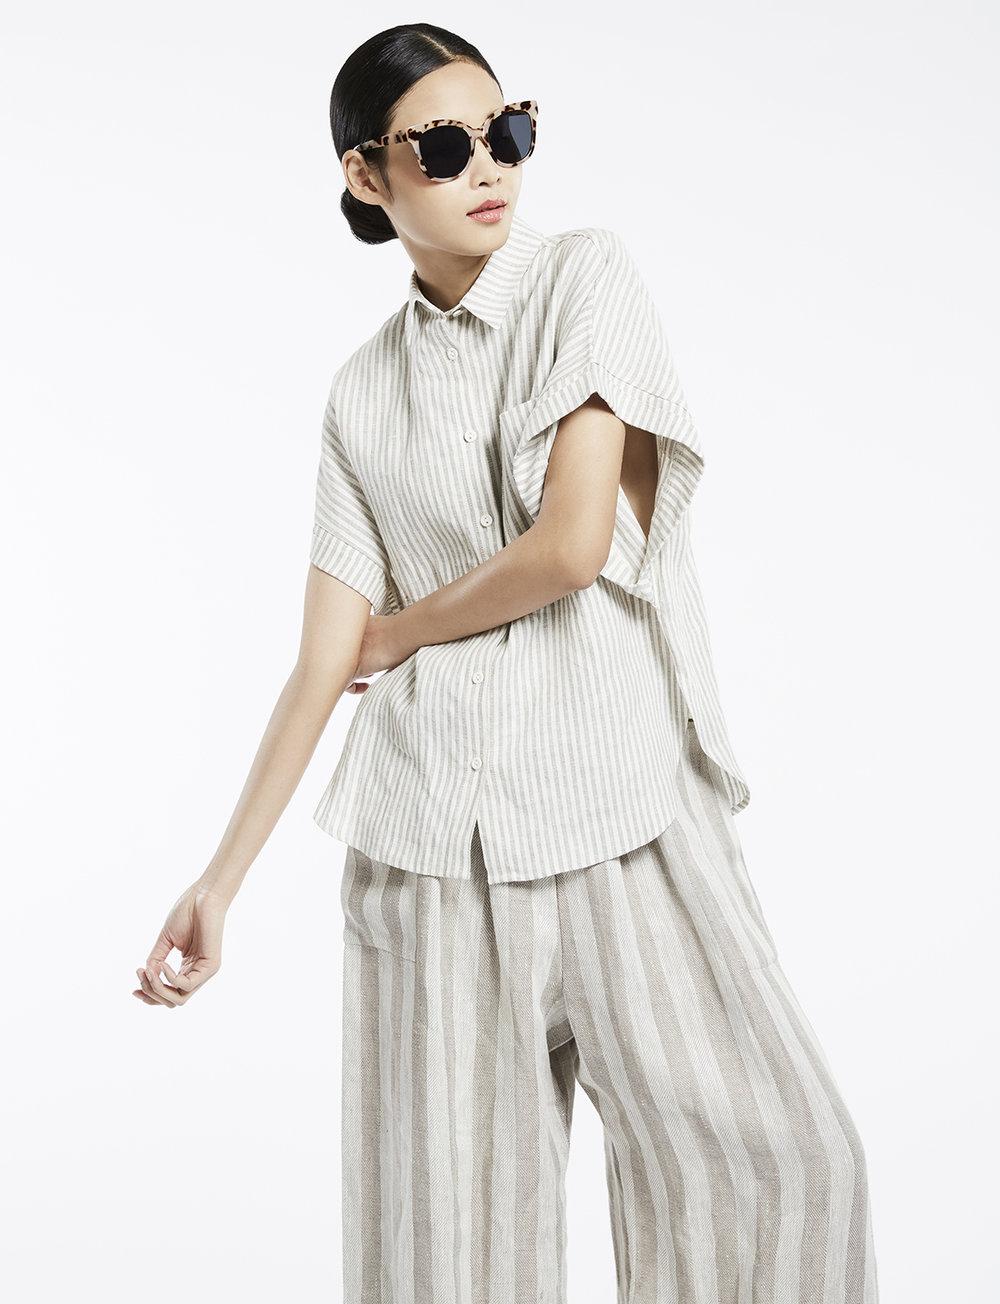 170305FashionPhotographer_FashionEditorial_StripesEditorial_STUDIO_By_BriJohnson_0102.jpg